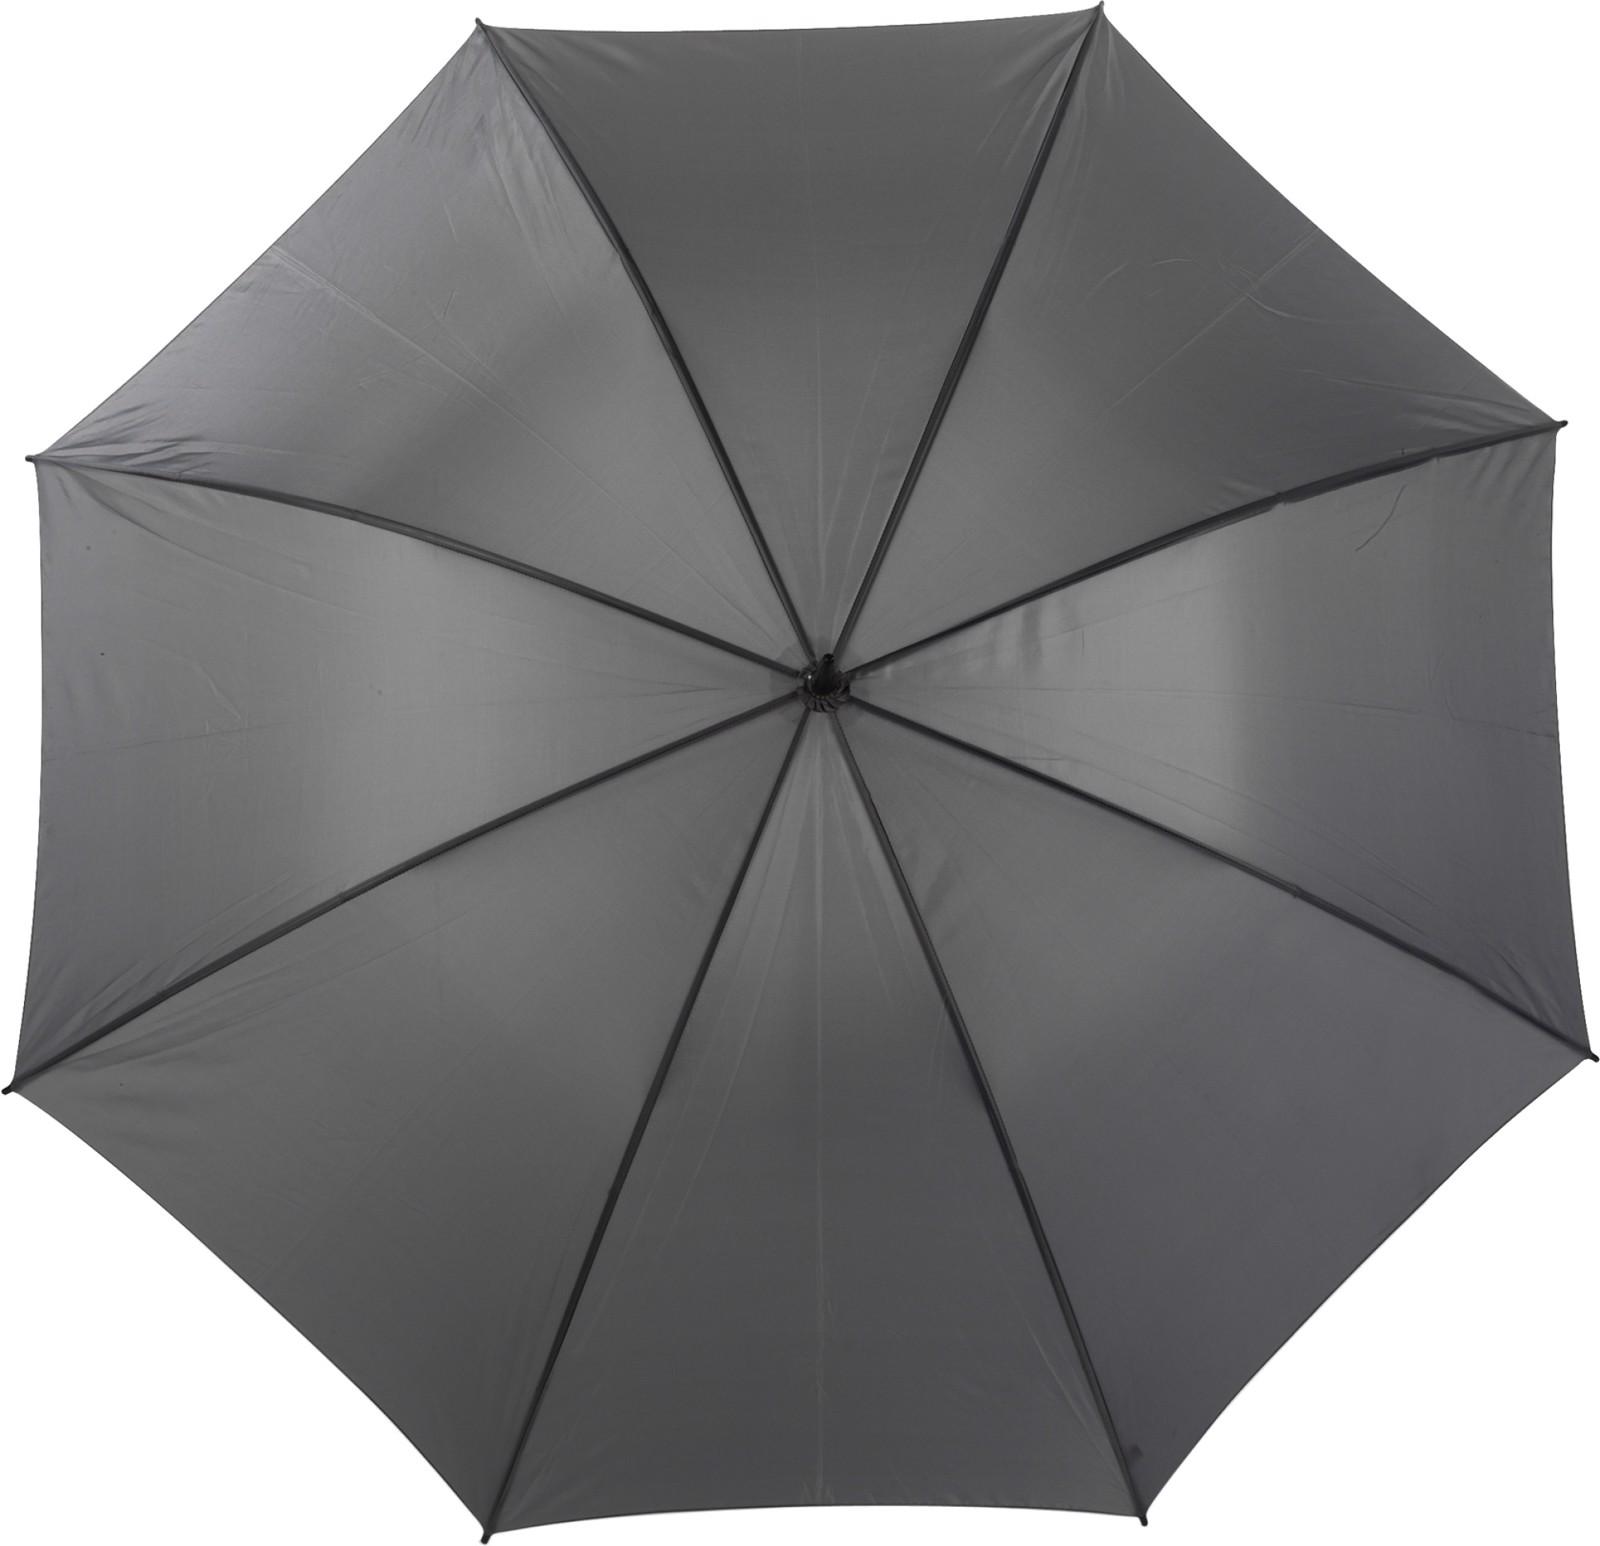 Polyester (210T) umbrella - Grey